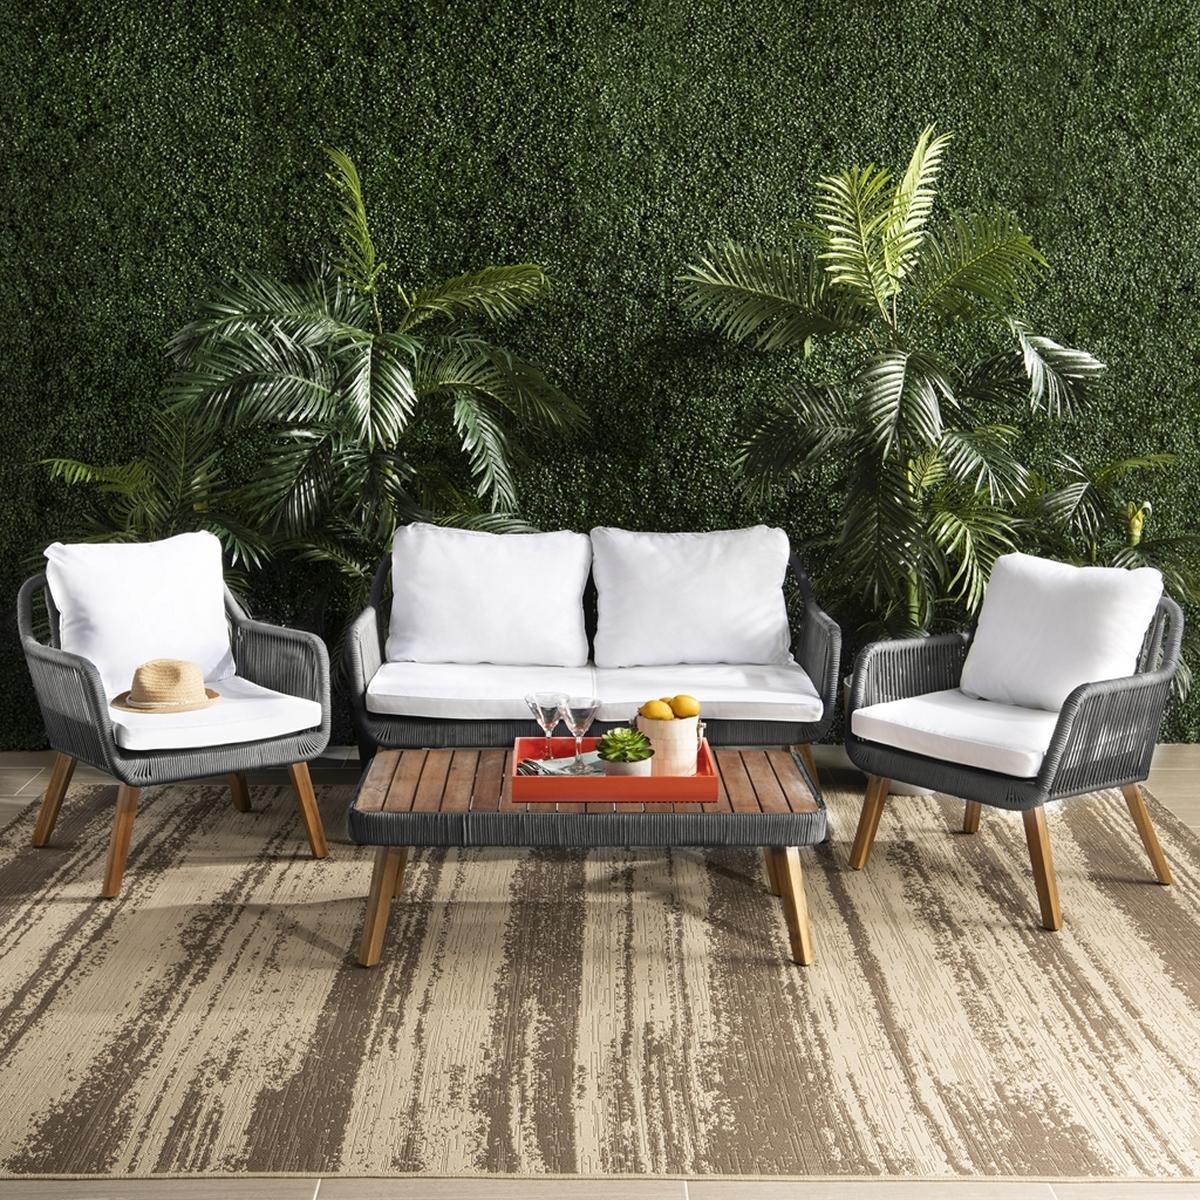 PAT7049A Patio Sets - 4 Piece - Furniture by Safavieh on Safavieh Raldin id=79477